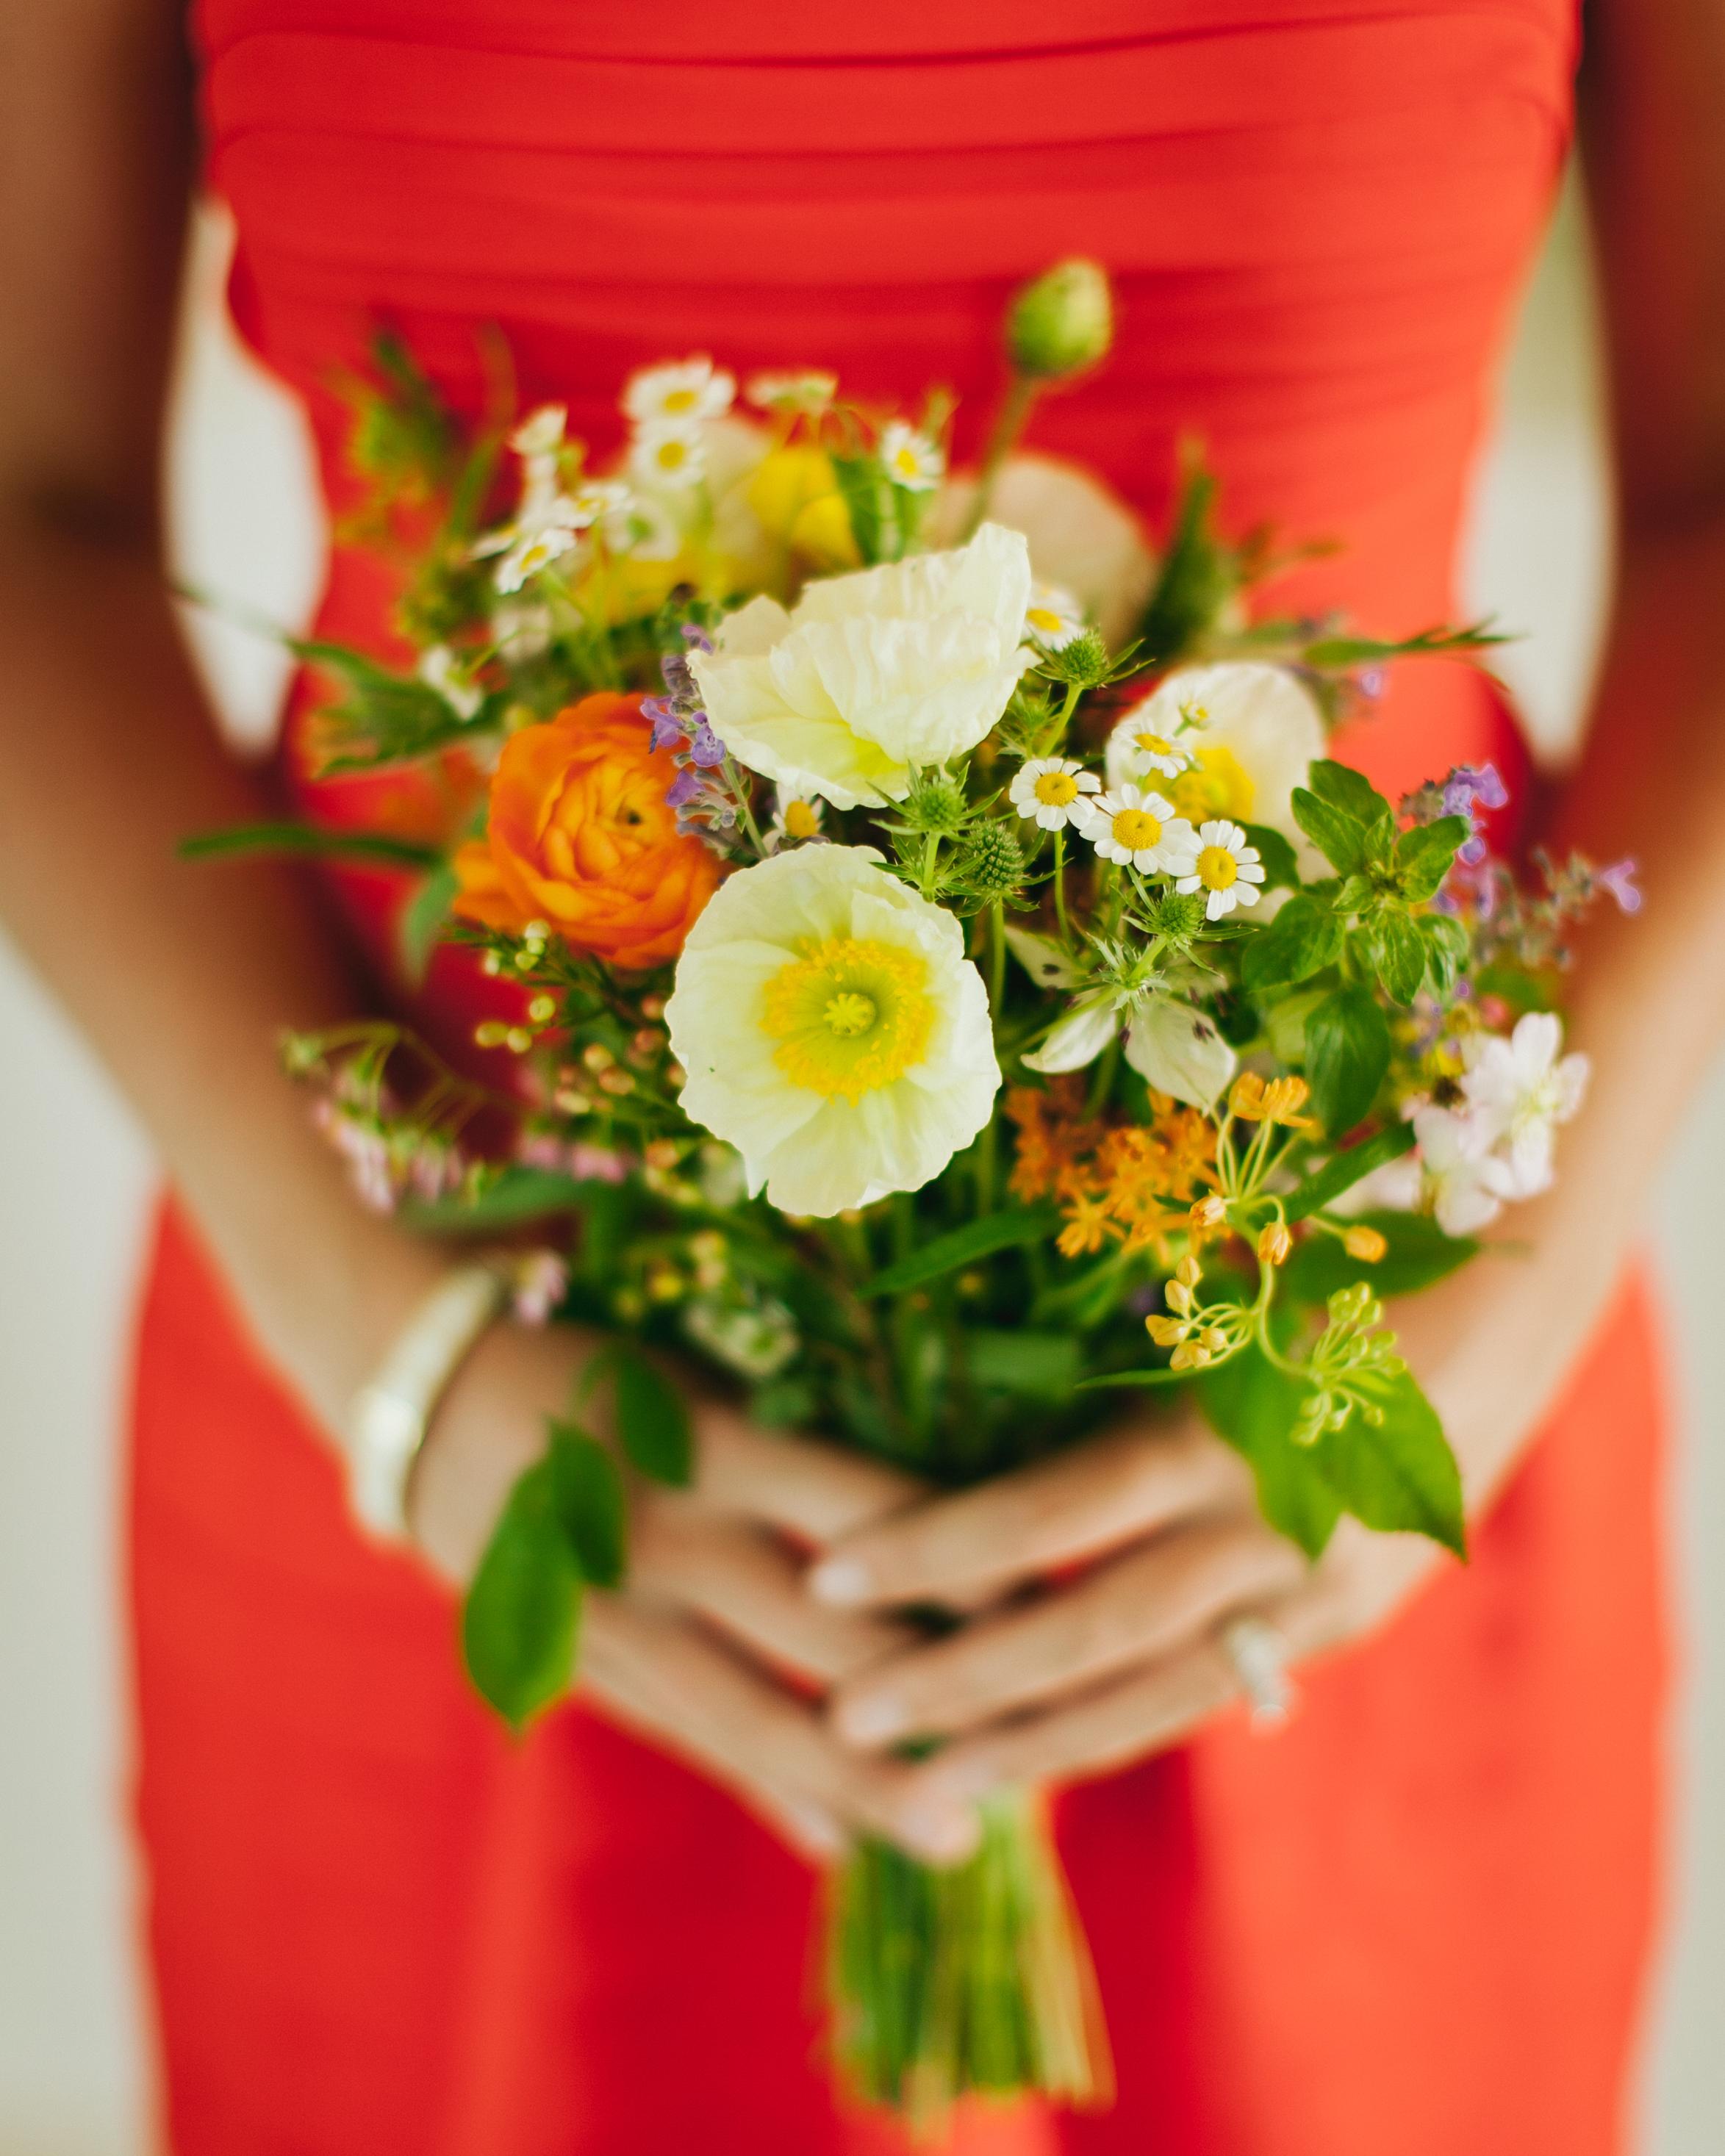 gabriela-tyson-wedding-bouquet-0295-s111708-1214.jpg